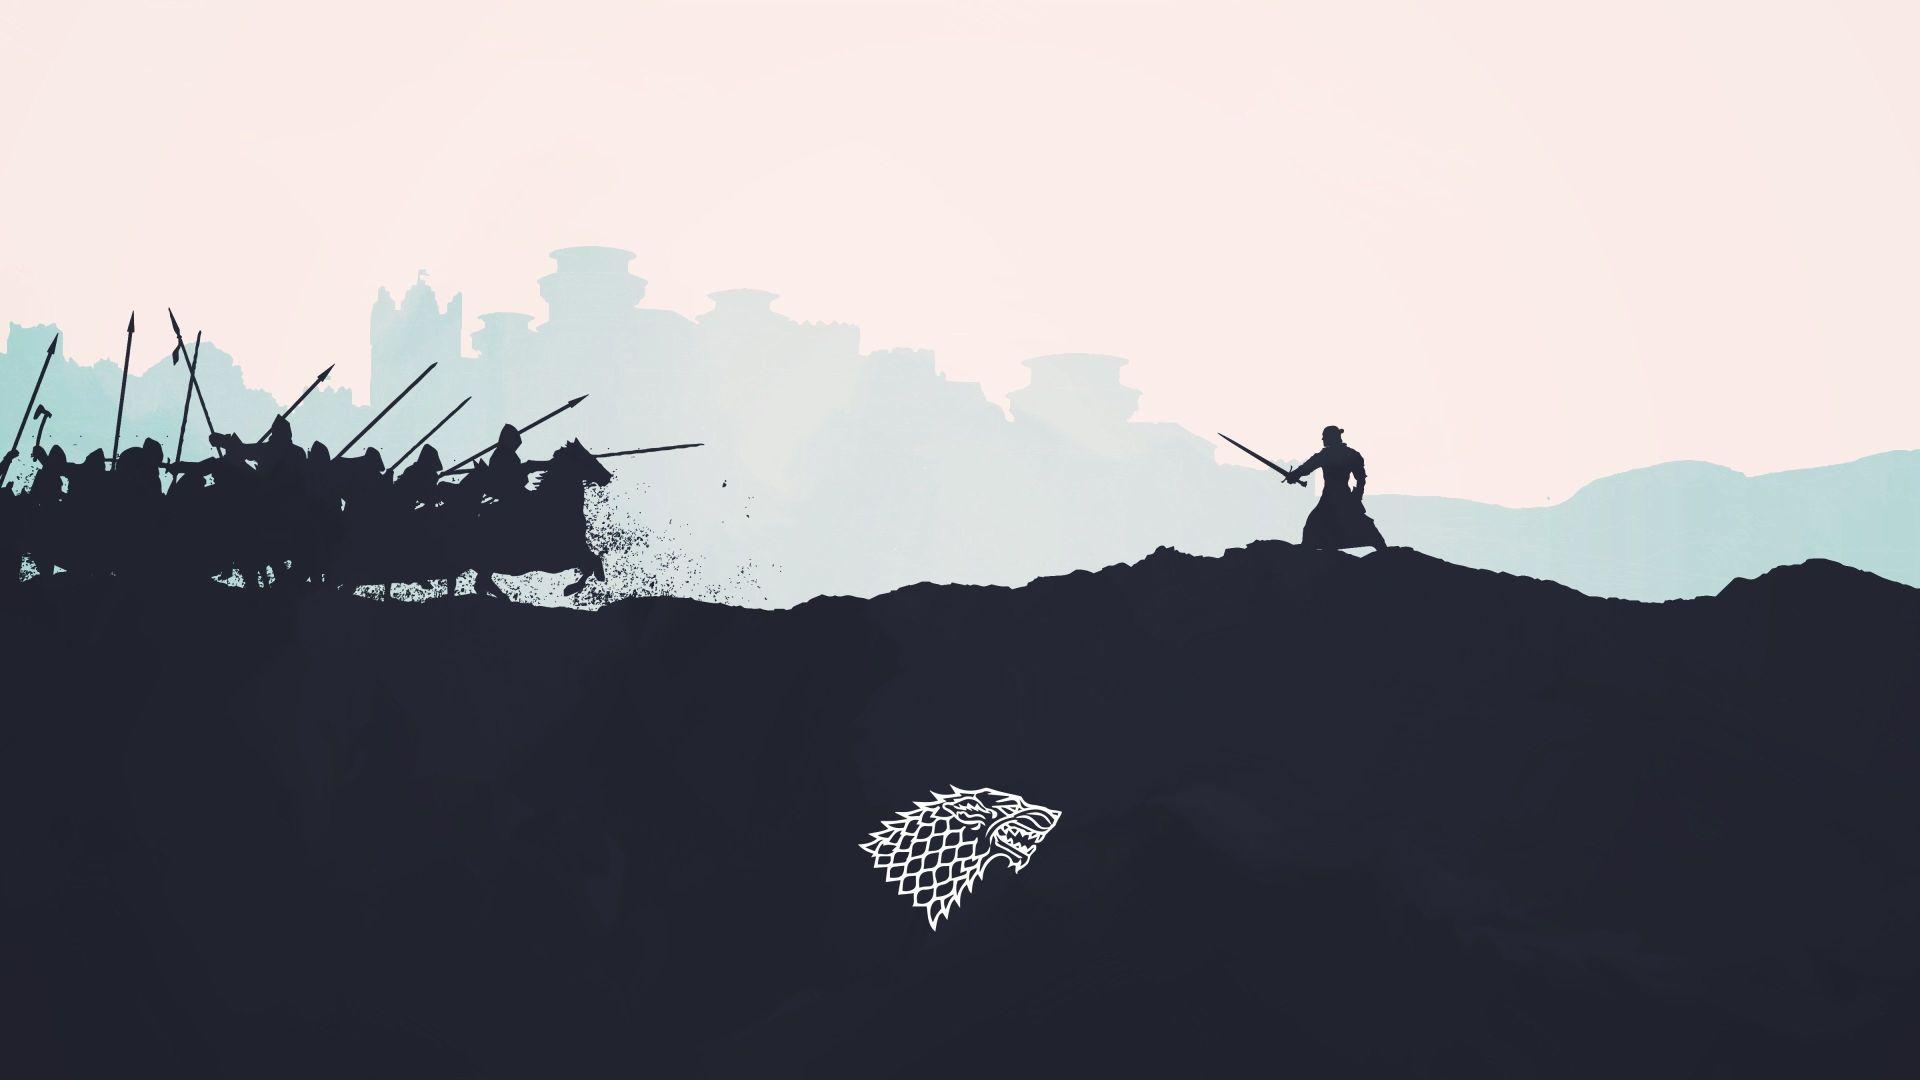 Game of Thrones Minimalist art